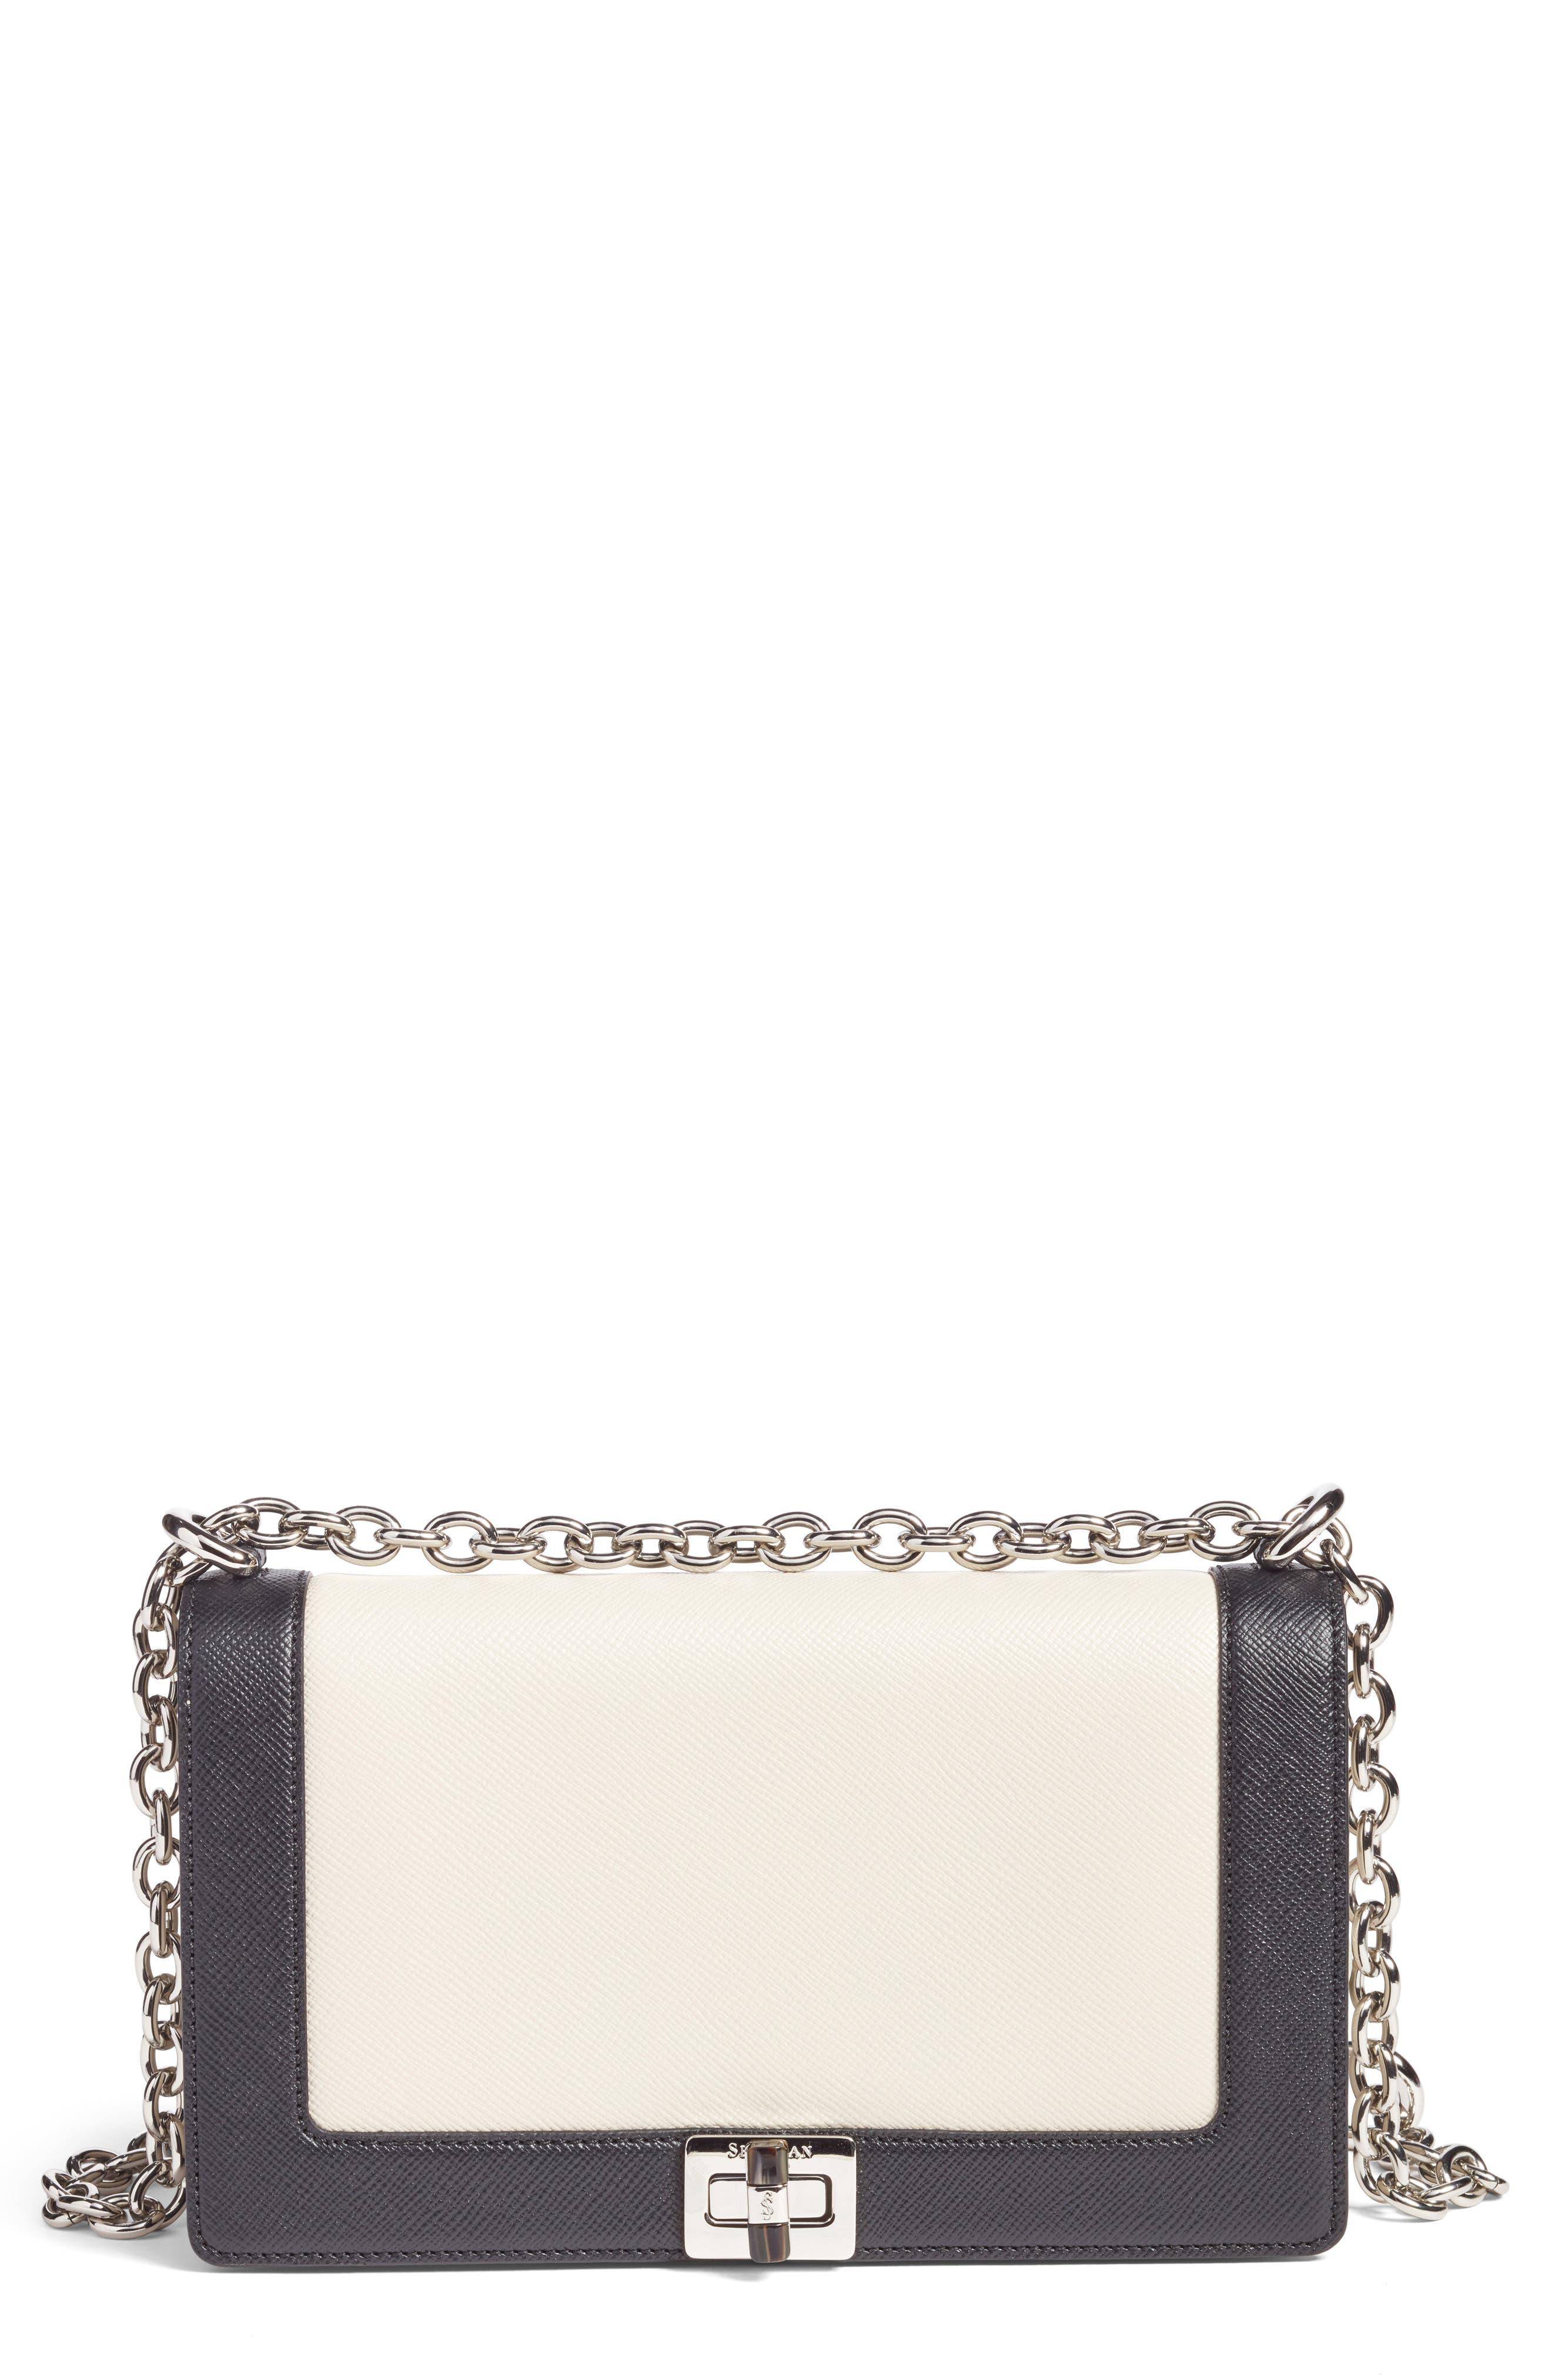 Roberta Evolution Leather Crossbody Bag,                             Main thumbnail 1, color,                             110